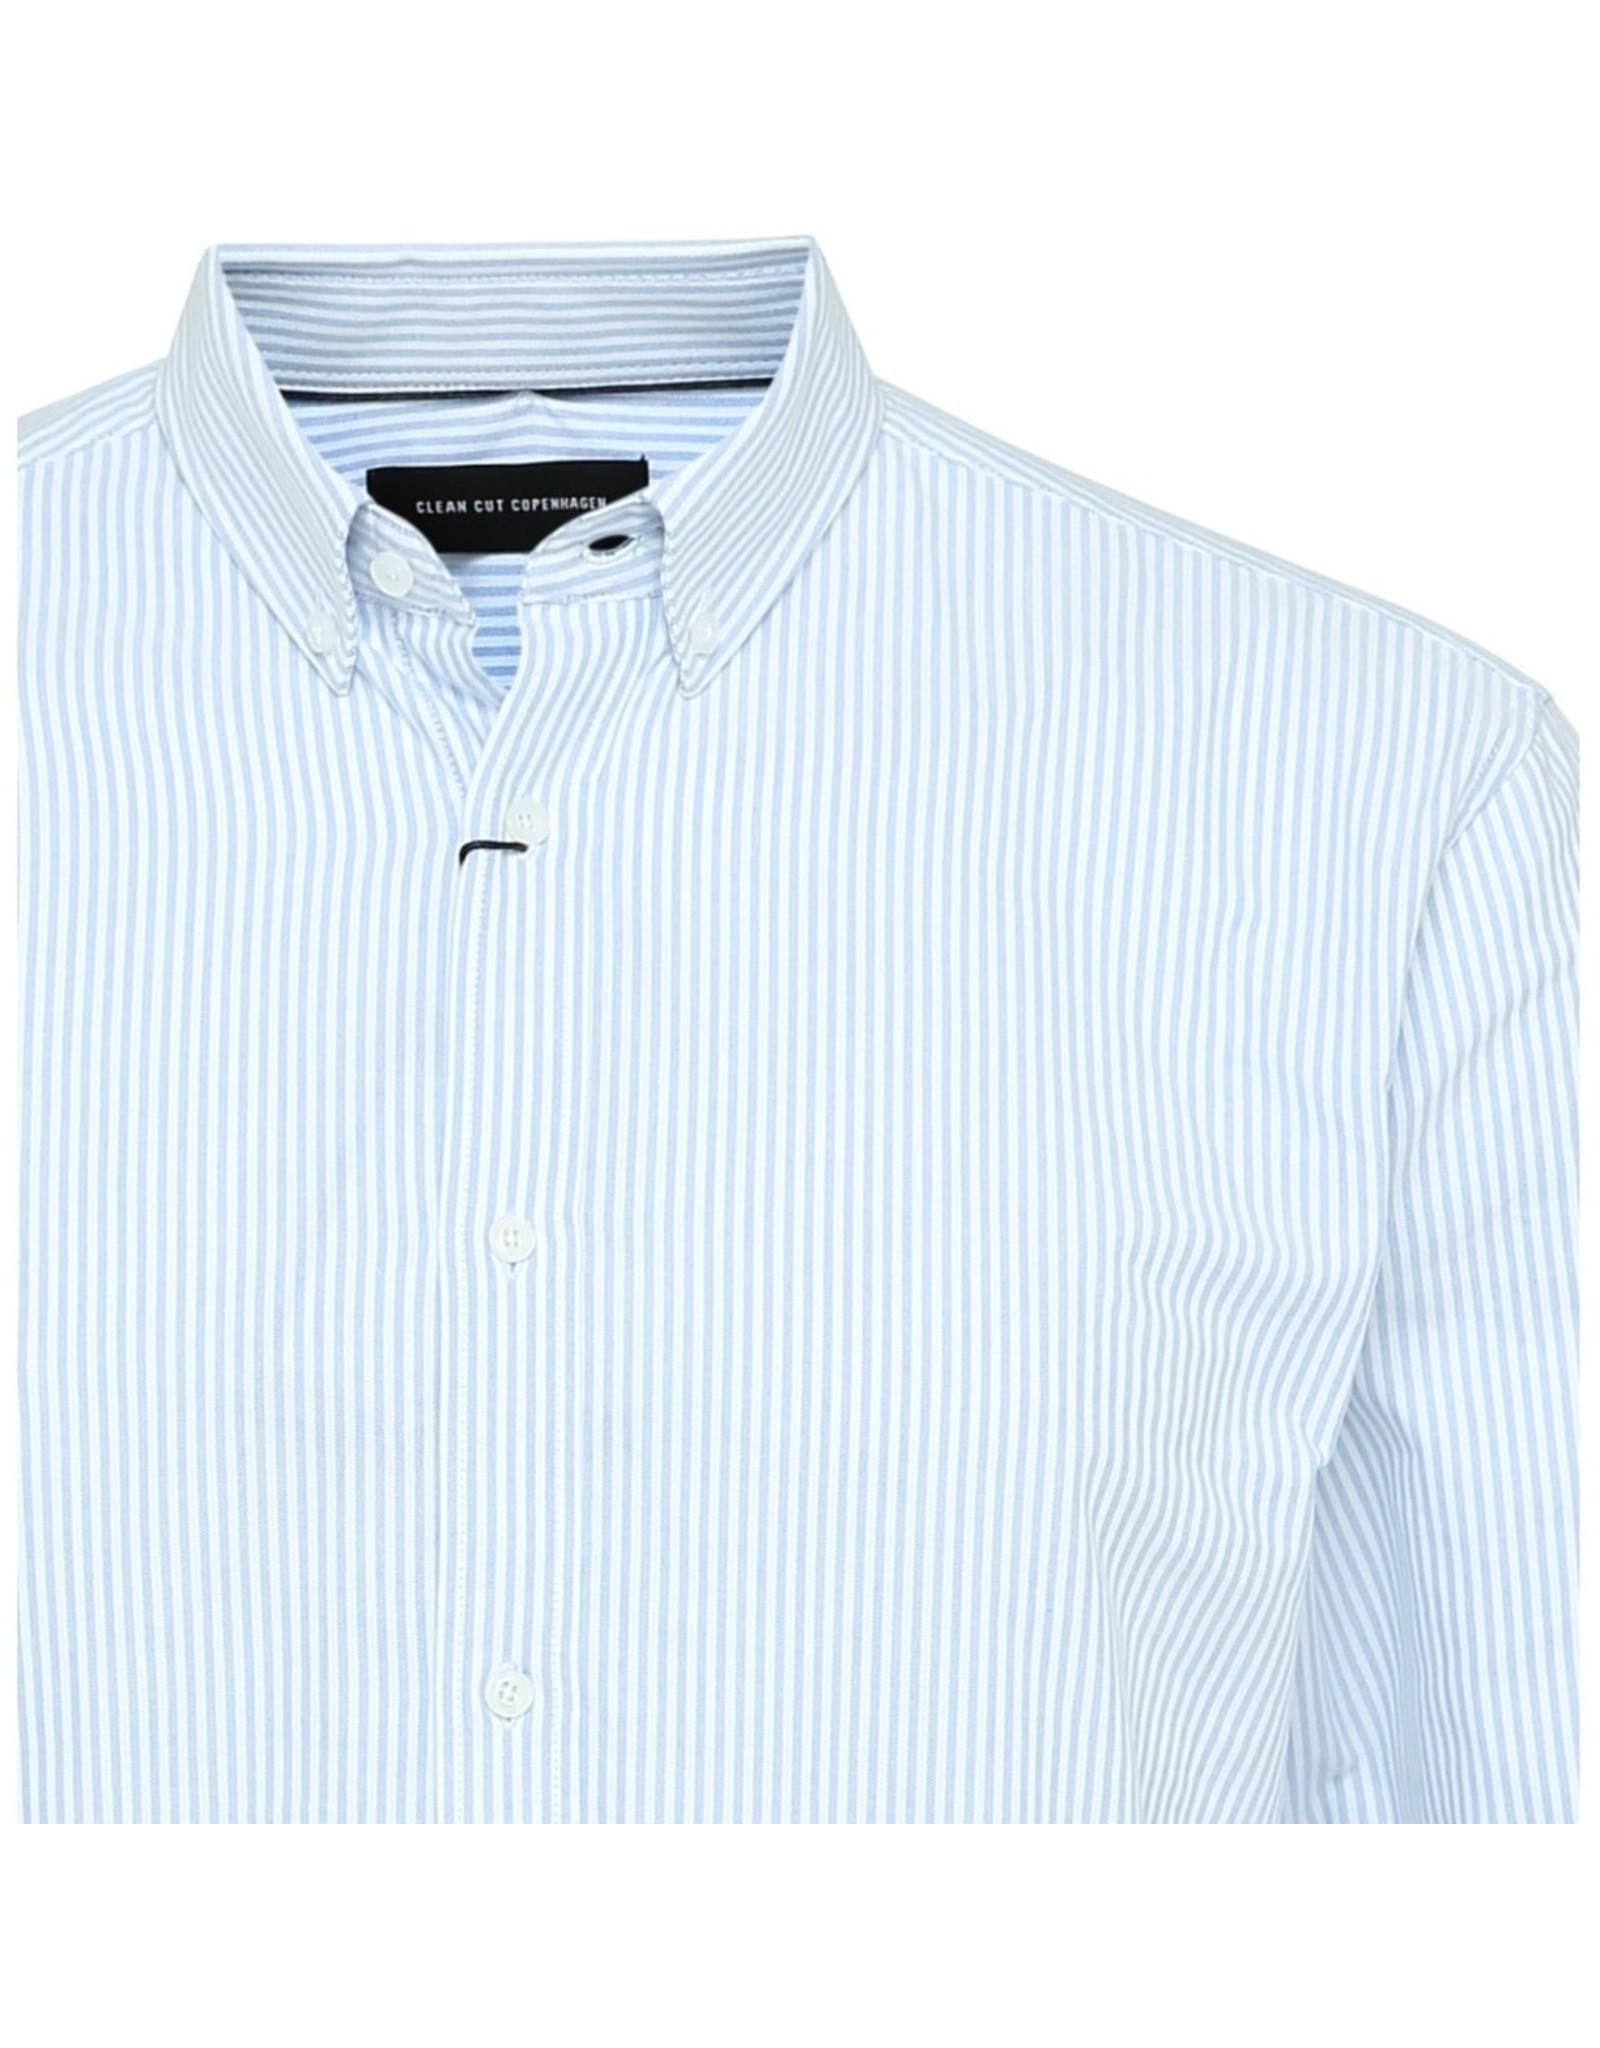 Clean Cut Copenhagen Oxford Stripe Shirt